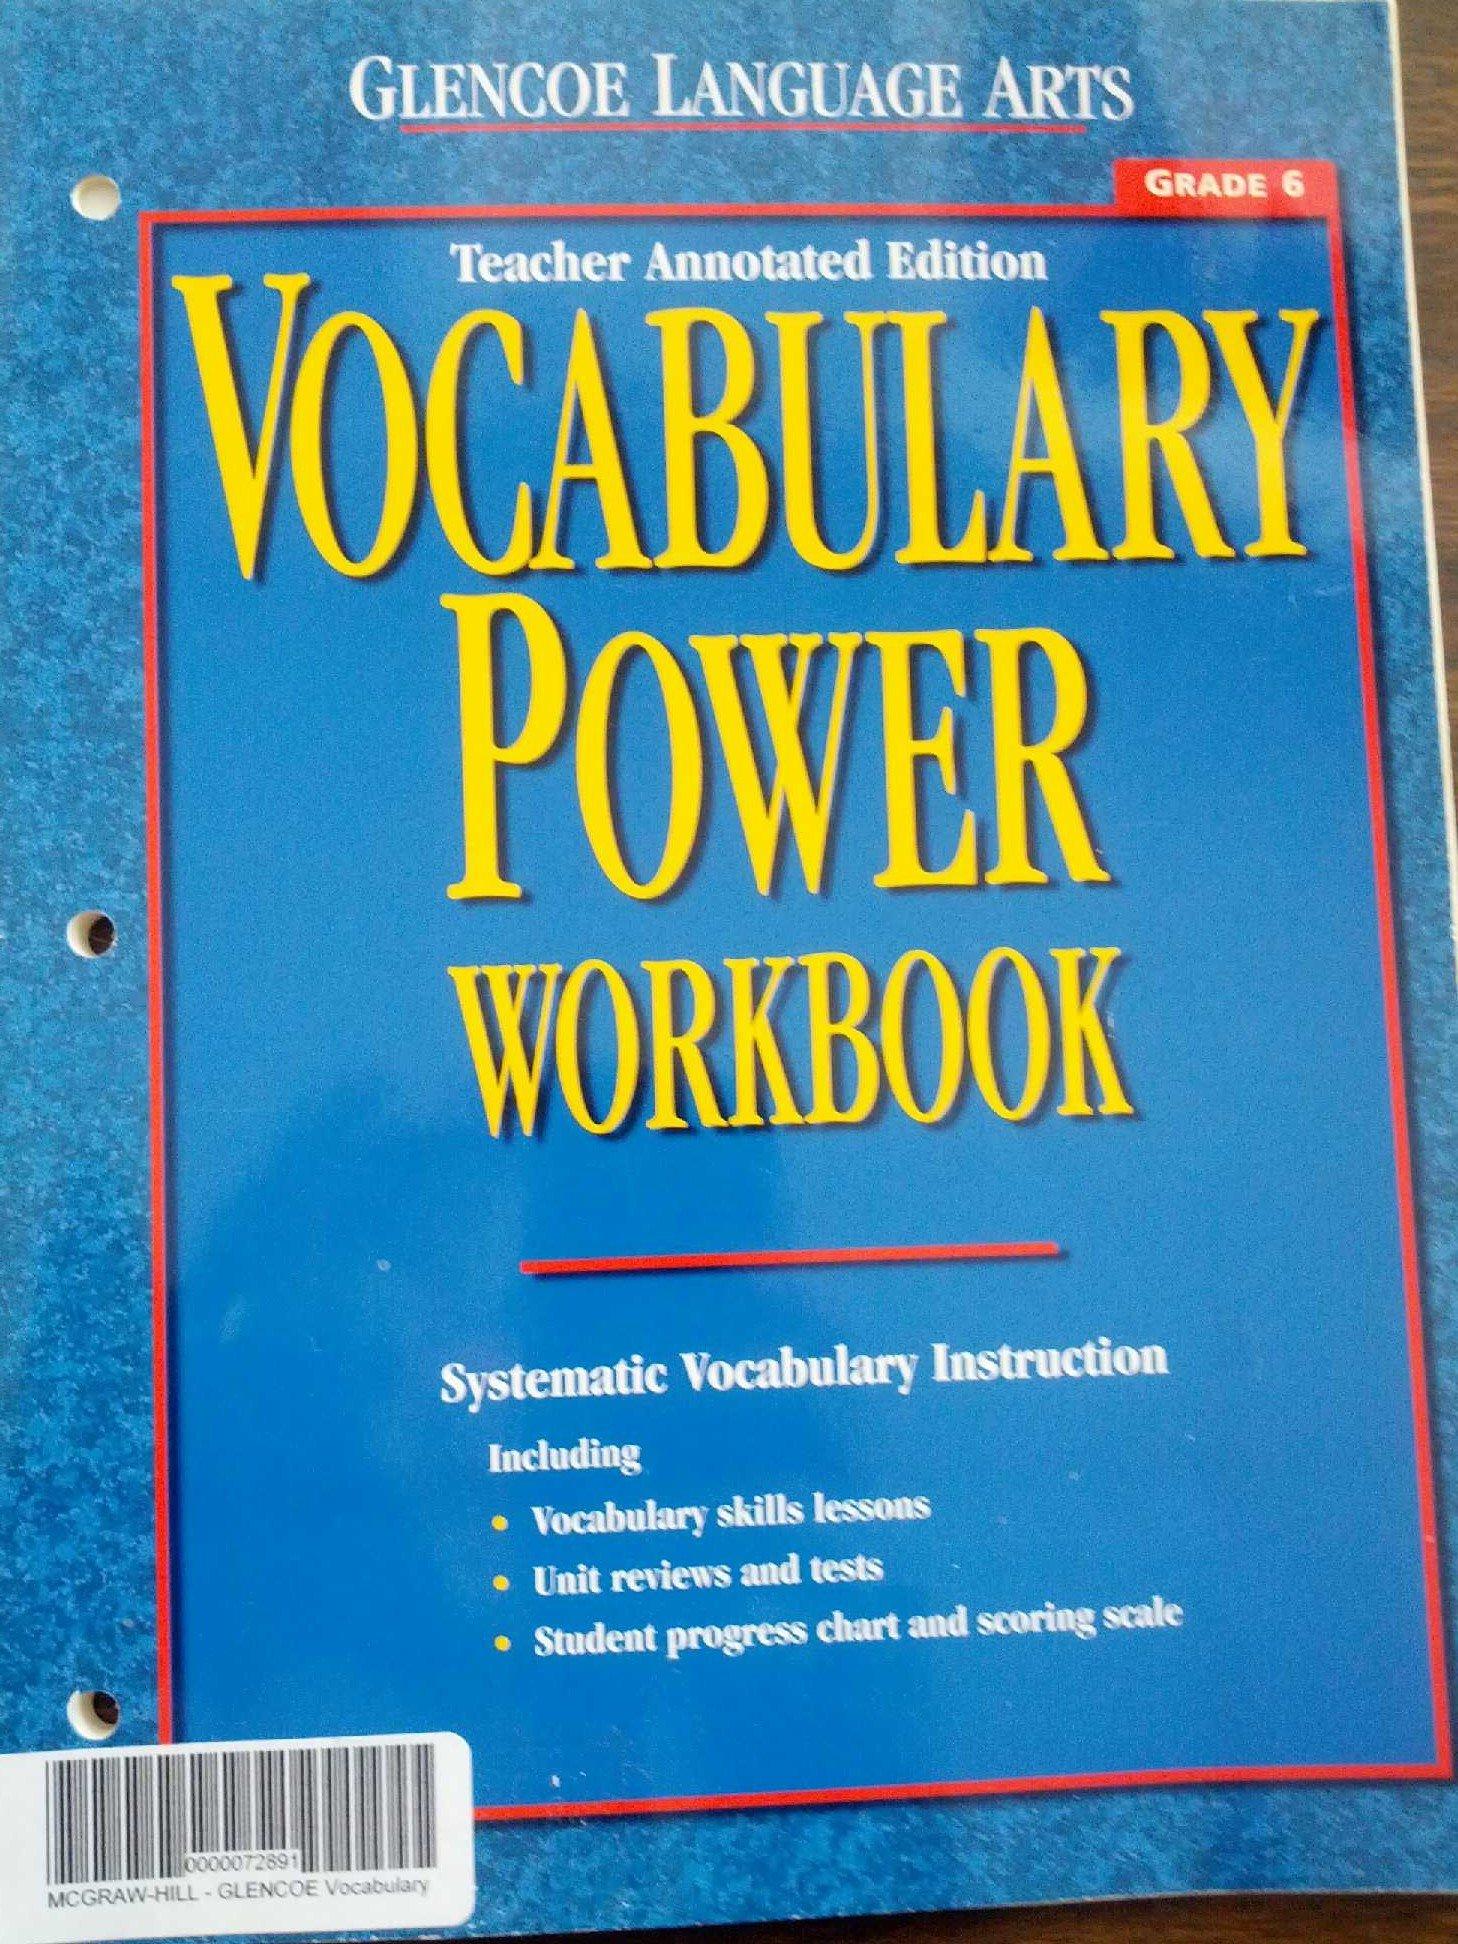 Vocabulary Power Workbook, Grade 6, Teacher Annotated Edition ...